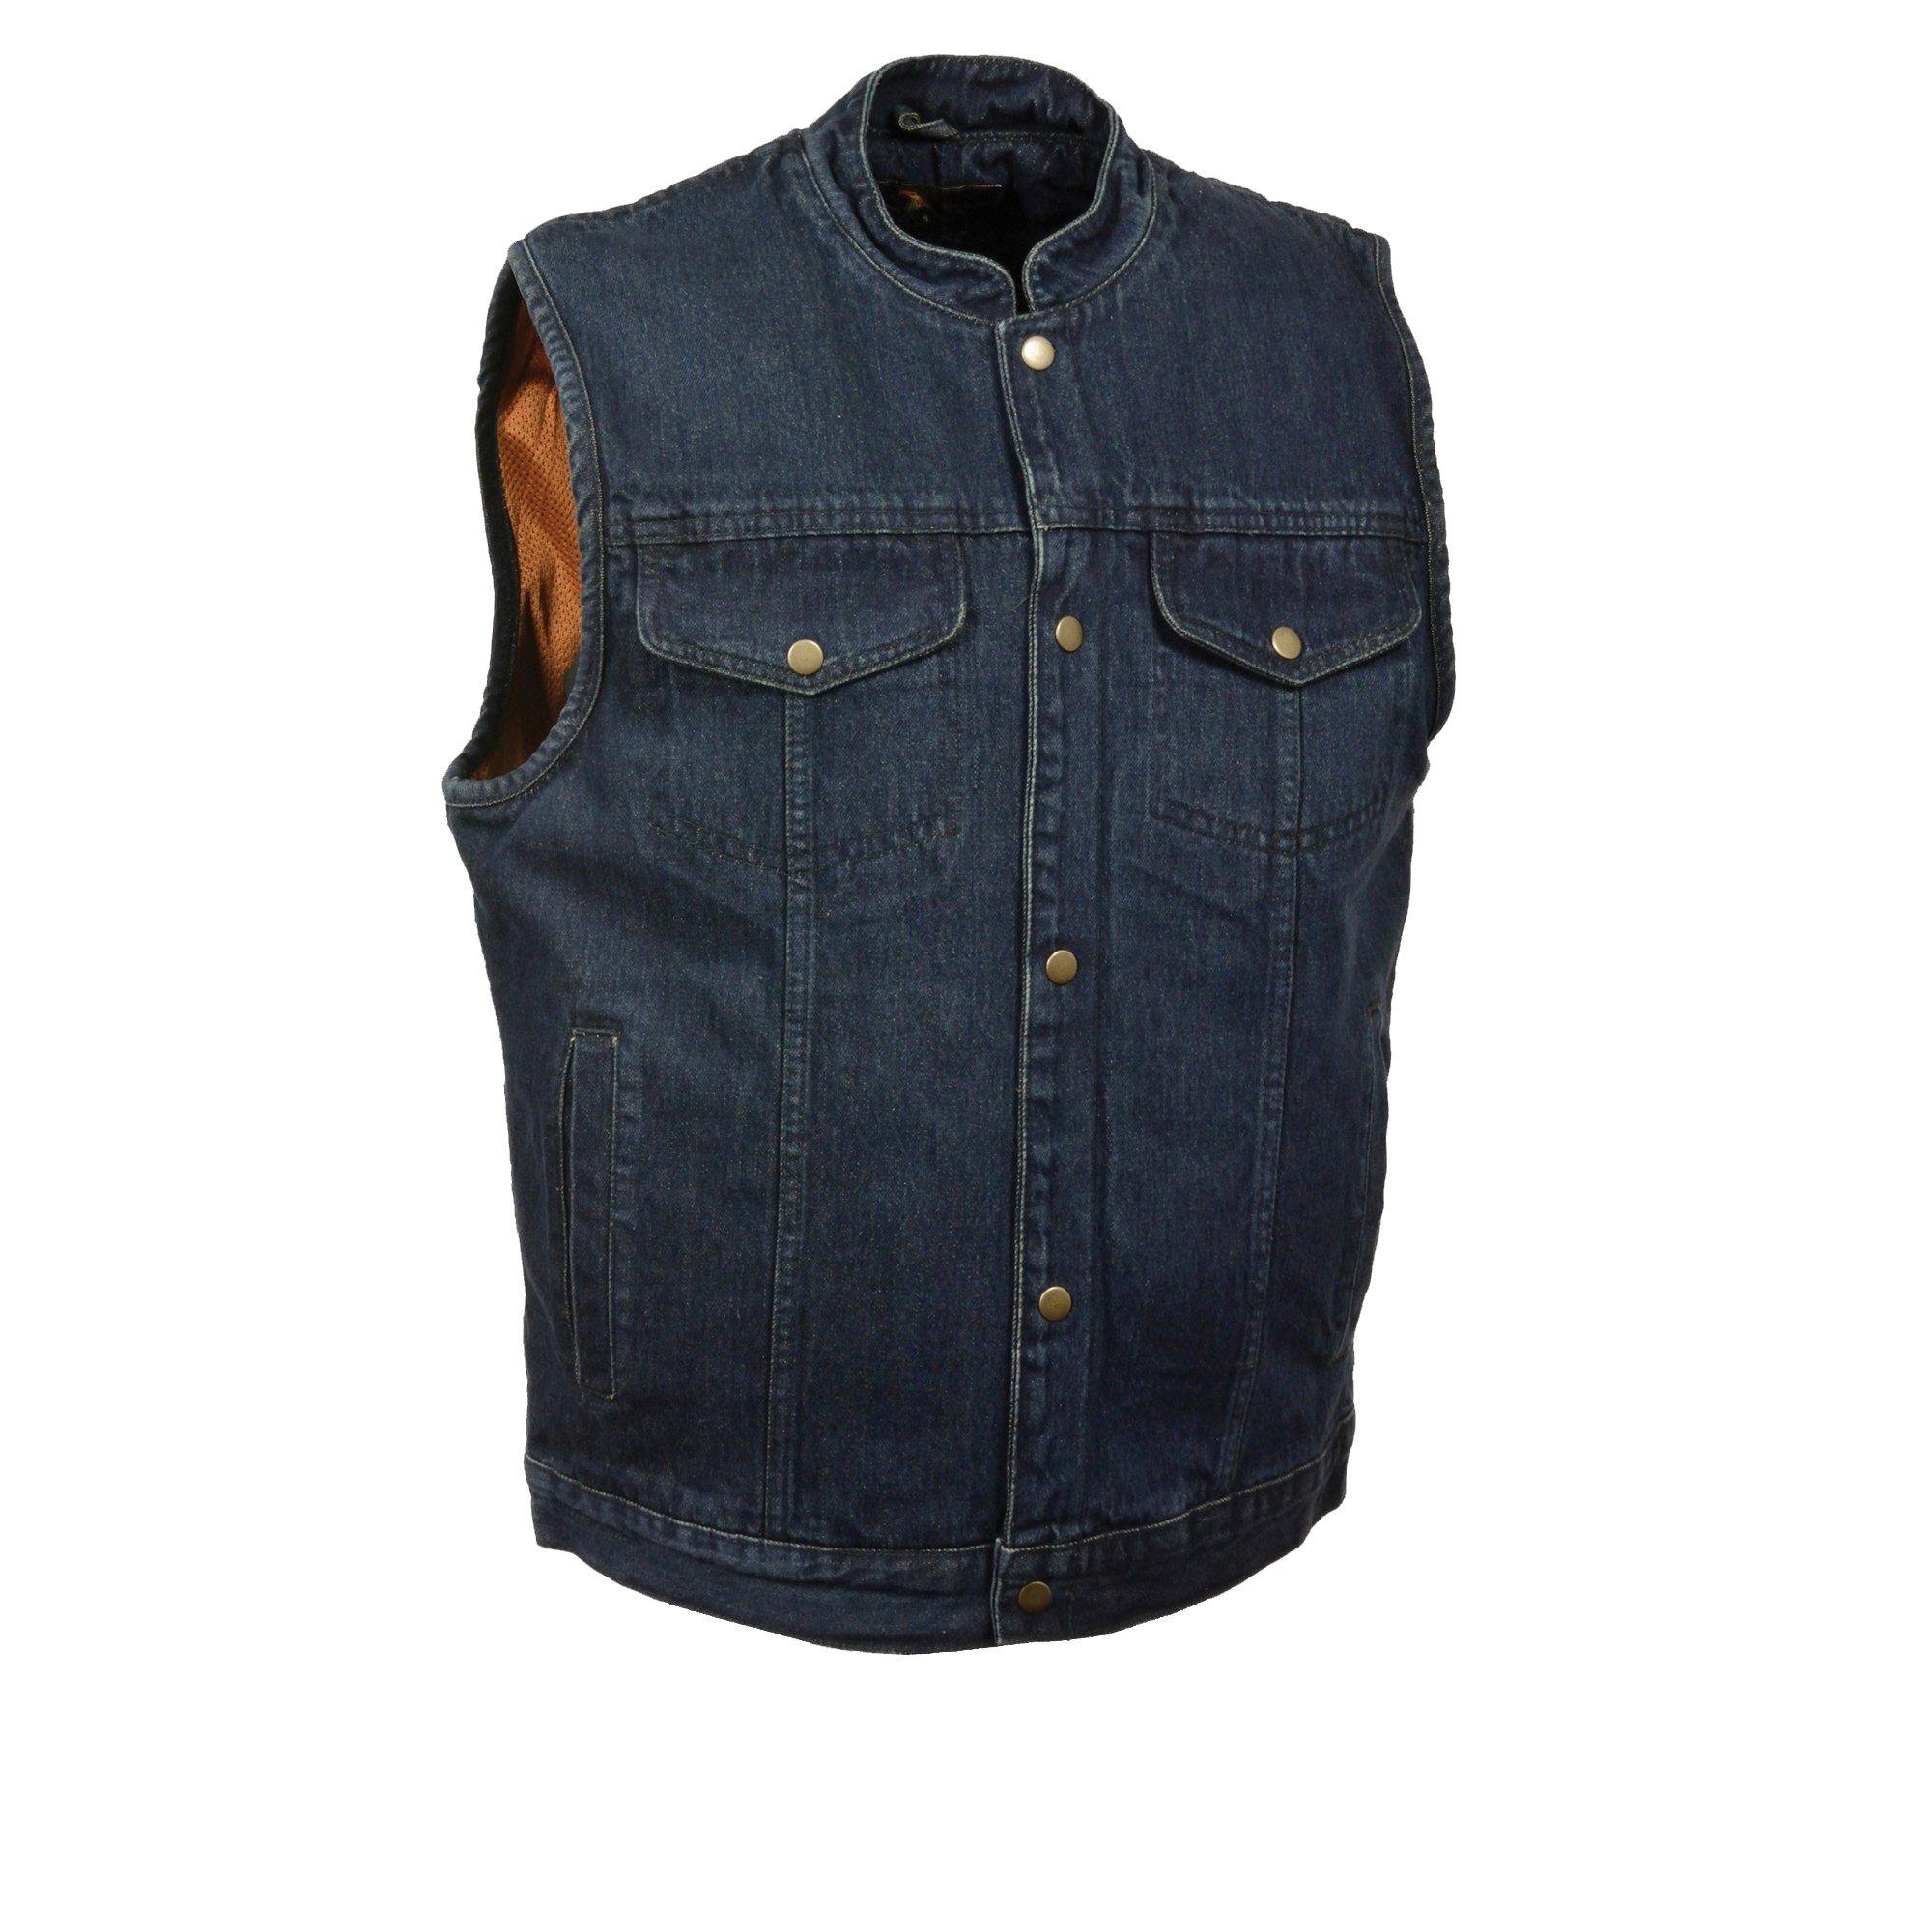 Milwaukee Performance Men's Denim Club Style Vest (Blue, XX-Large) (DM2238-BLU-2X) by Milwaukee Performance